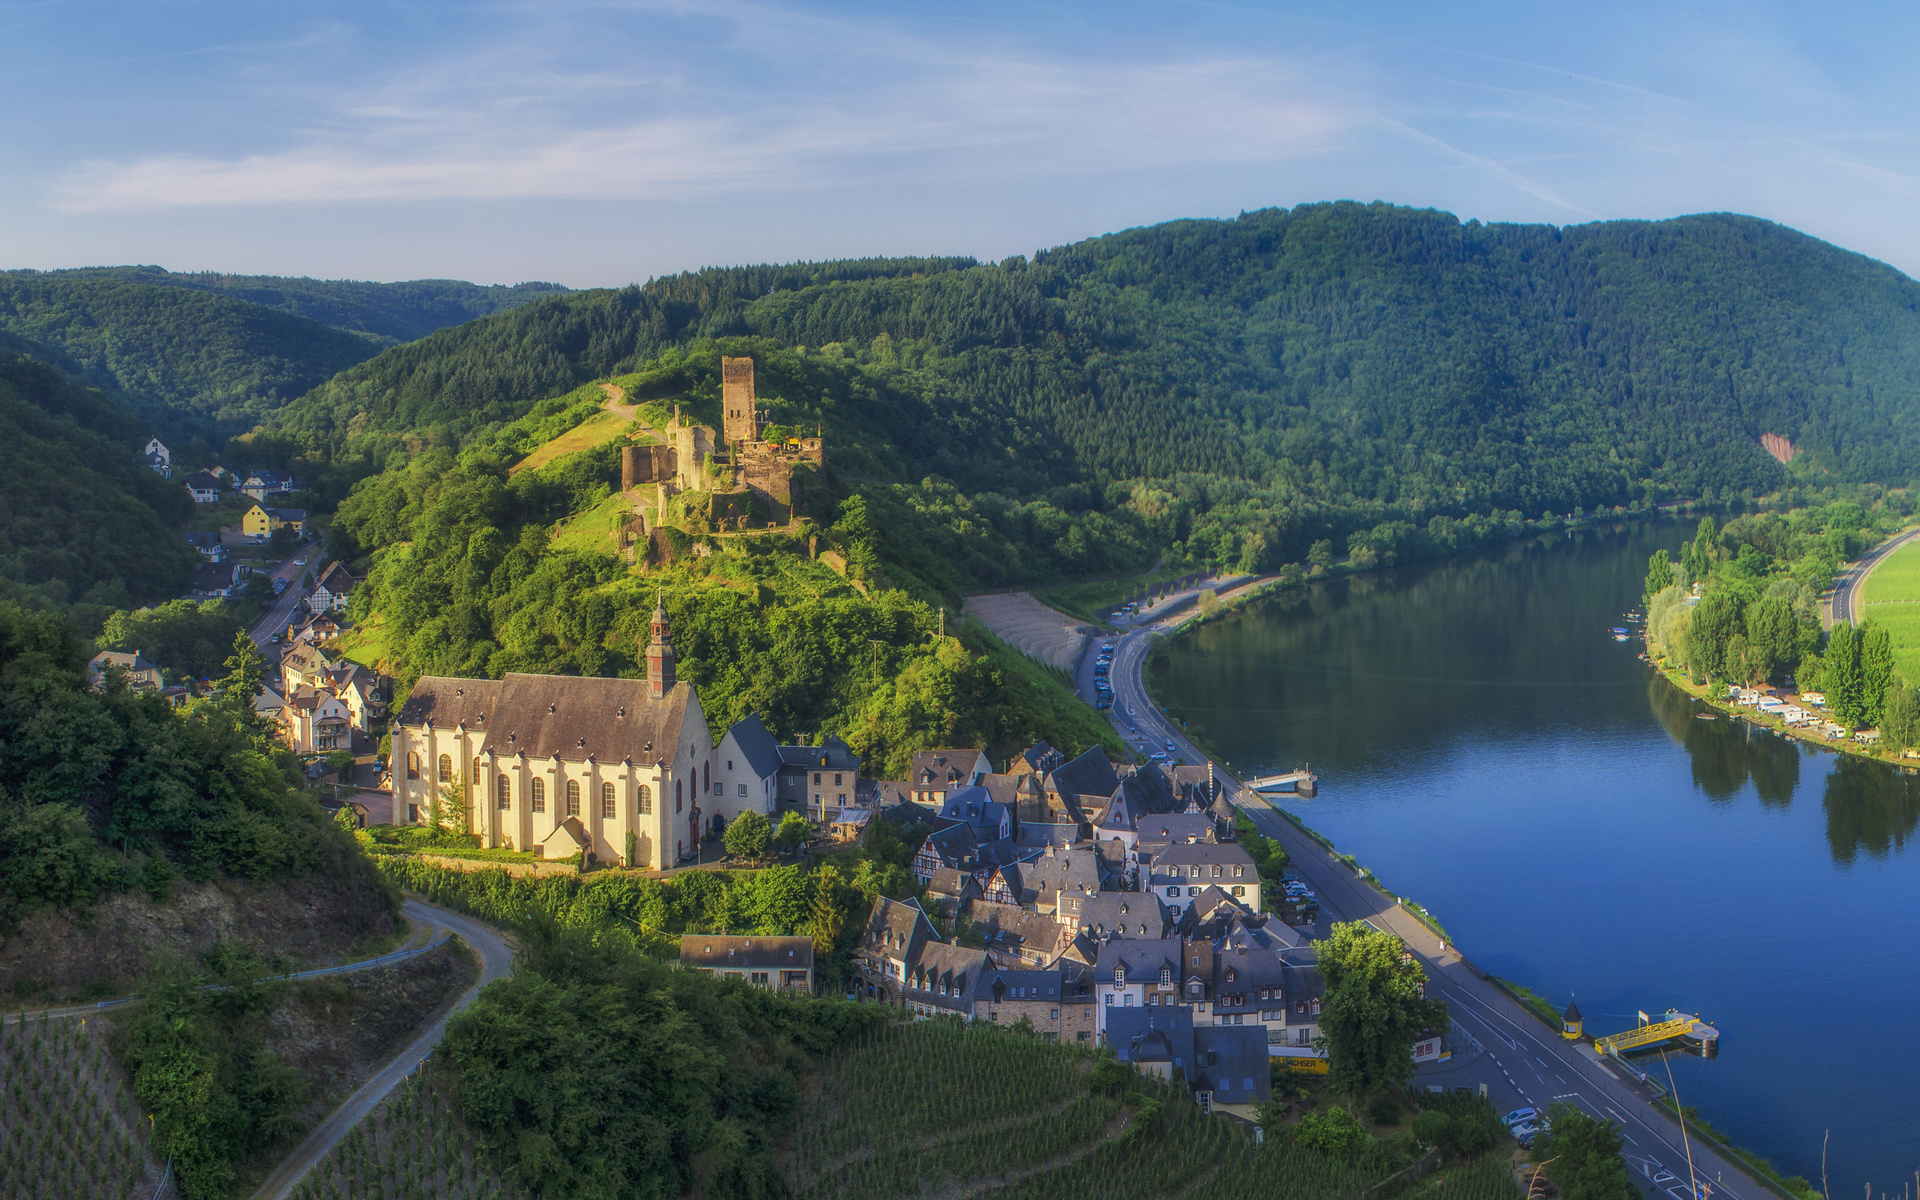 германия, дома, река, beilstein, холмы, городок